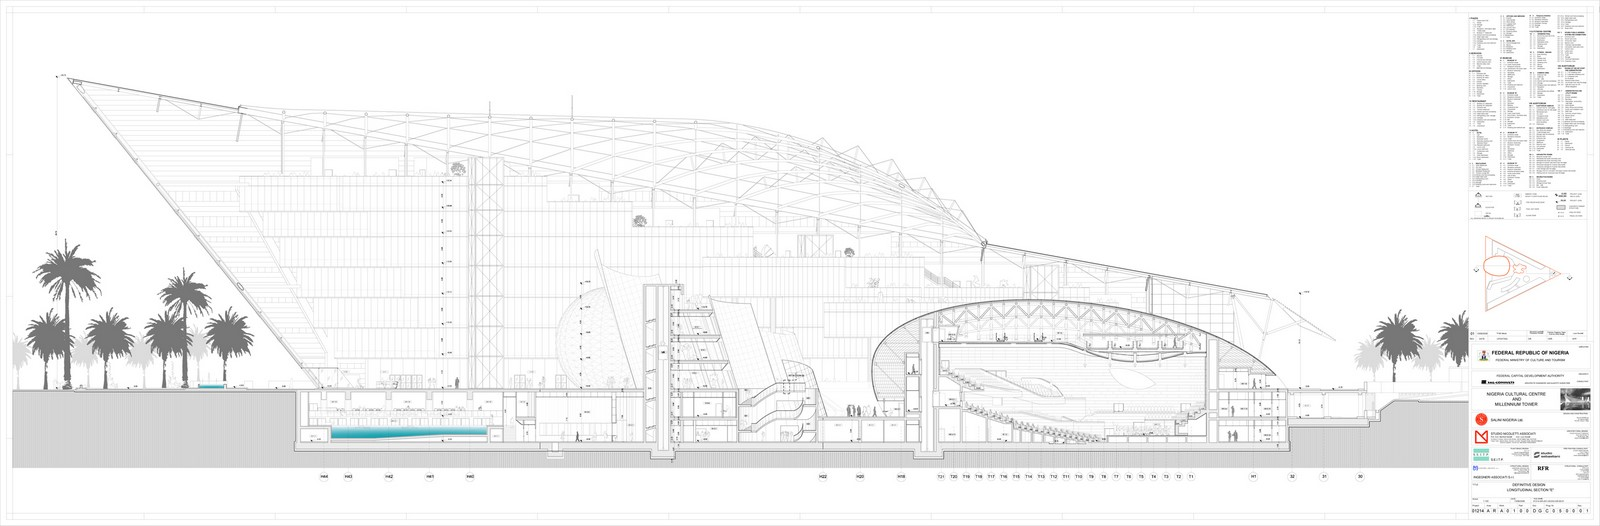 Nigerian Cultural Centre and Millenium Tower by Manfredi Nicoletti: Still Under construction - Sheet4